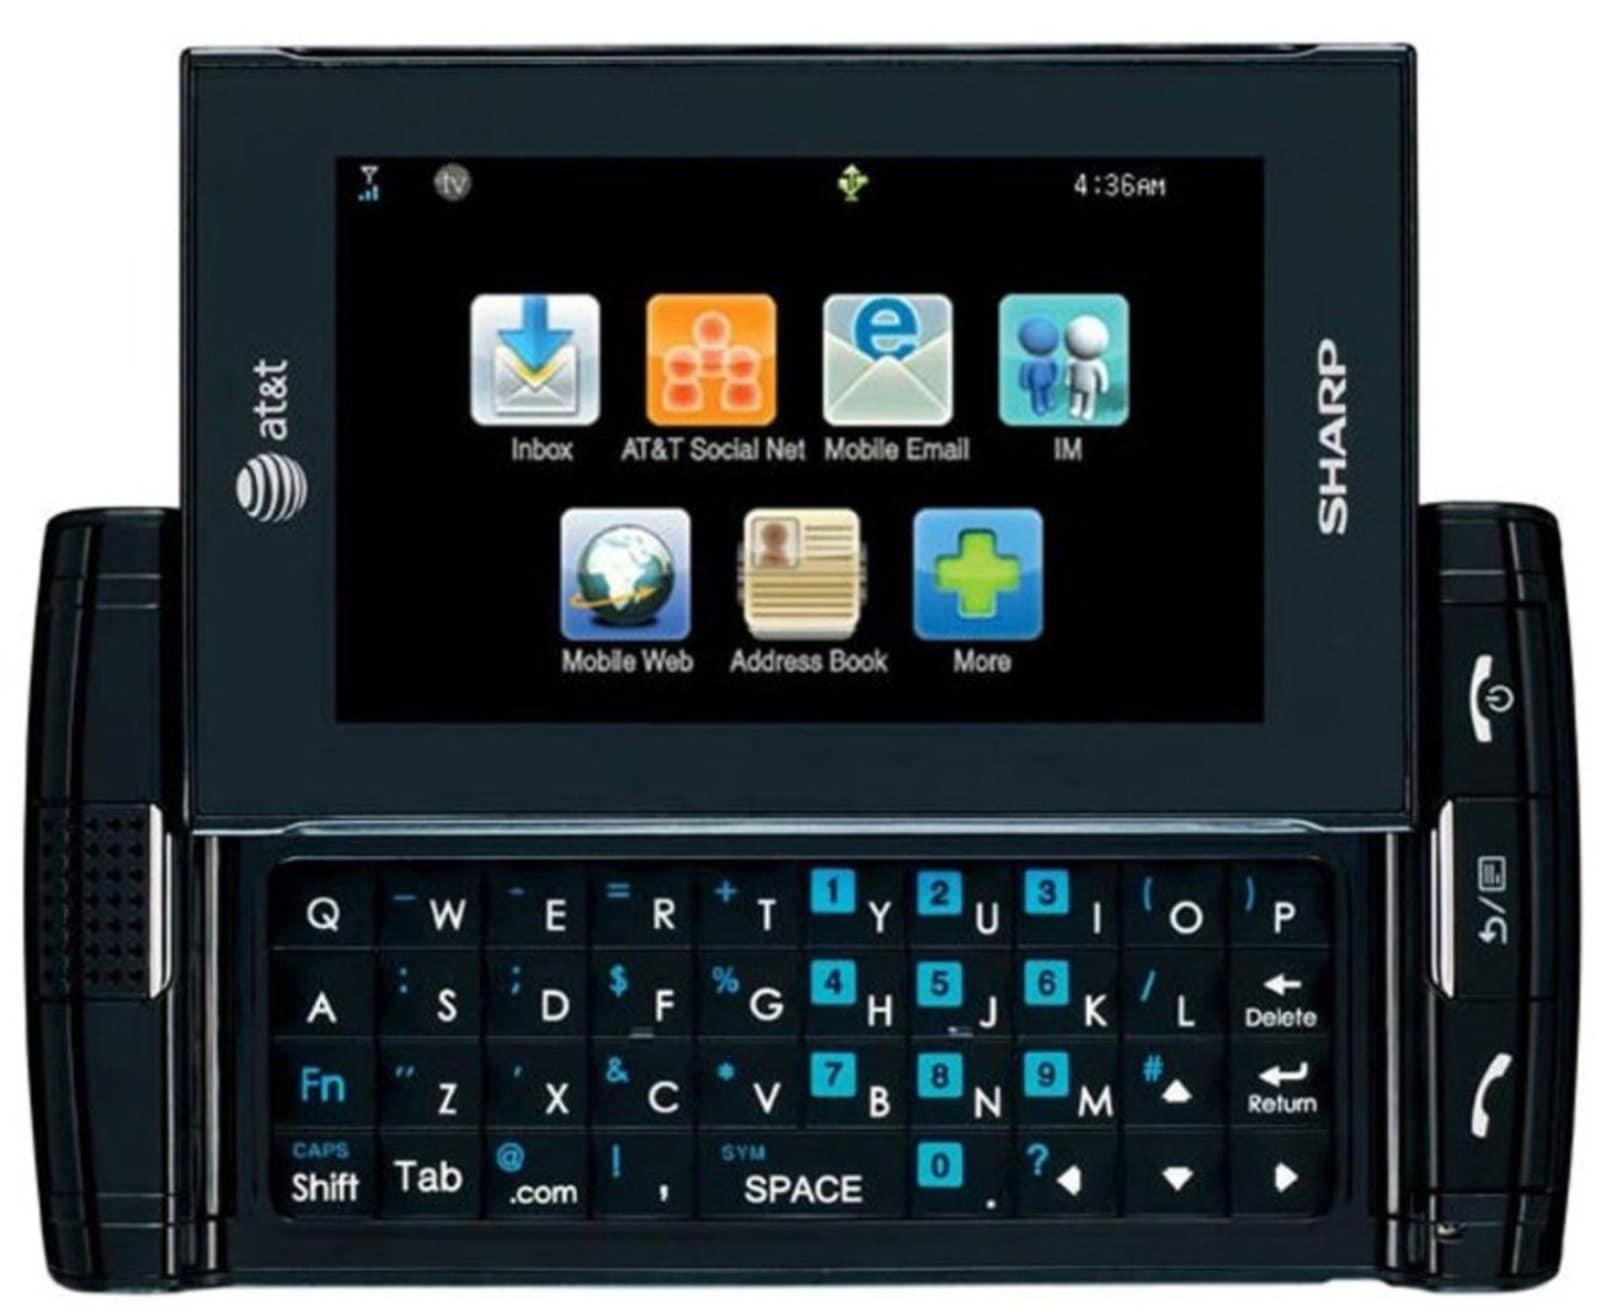 Sharp FX STX-2 GSM Unlocked Slider Cell Phone